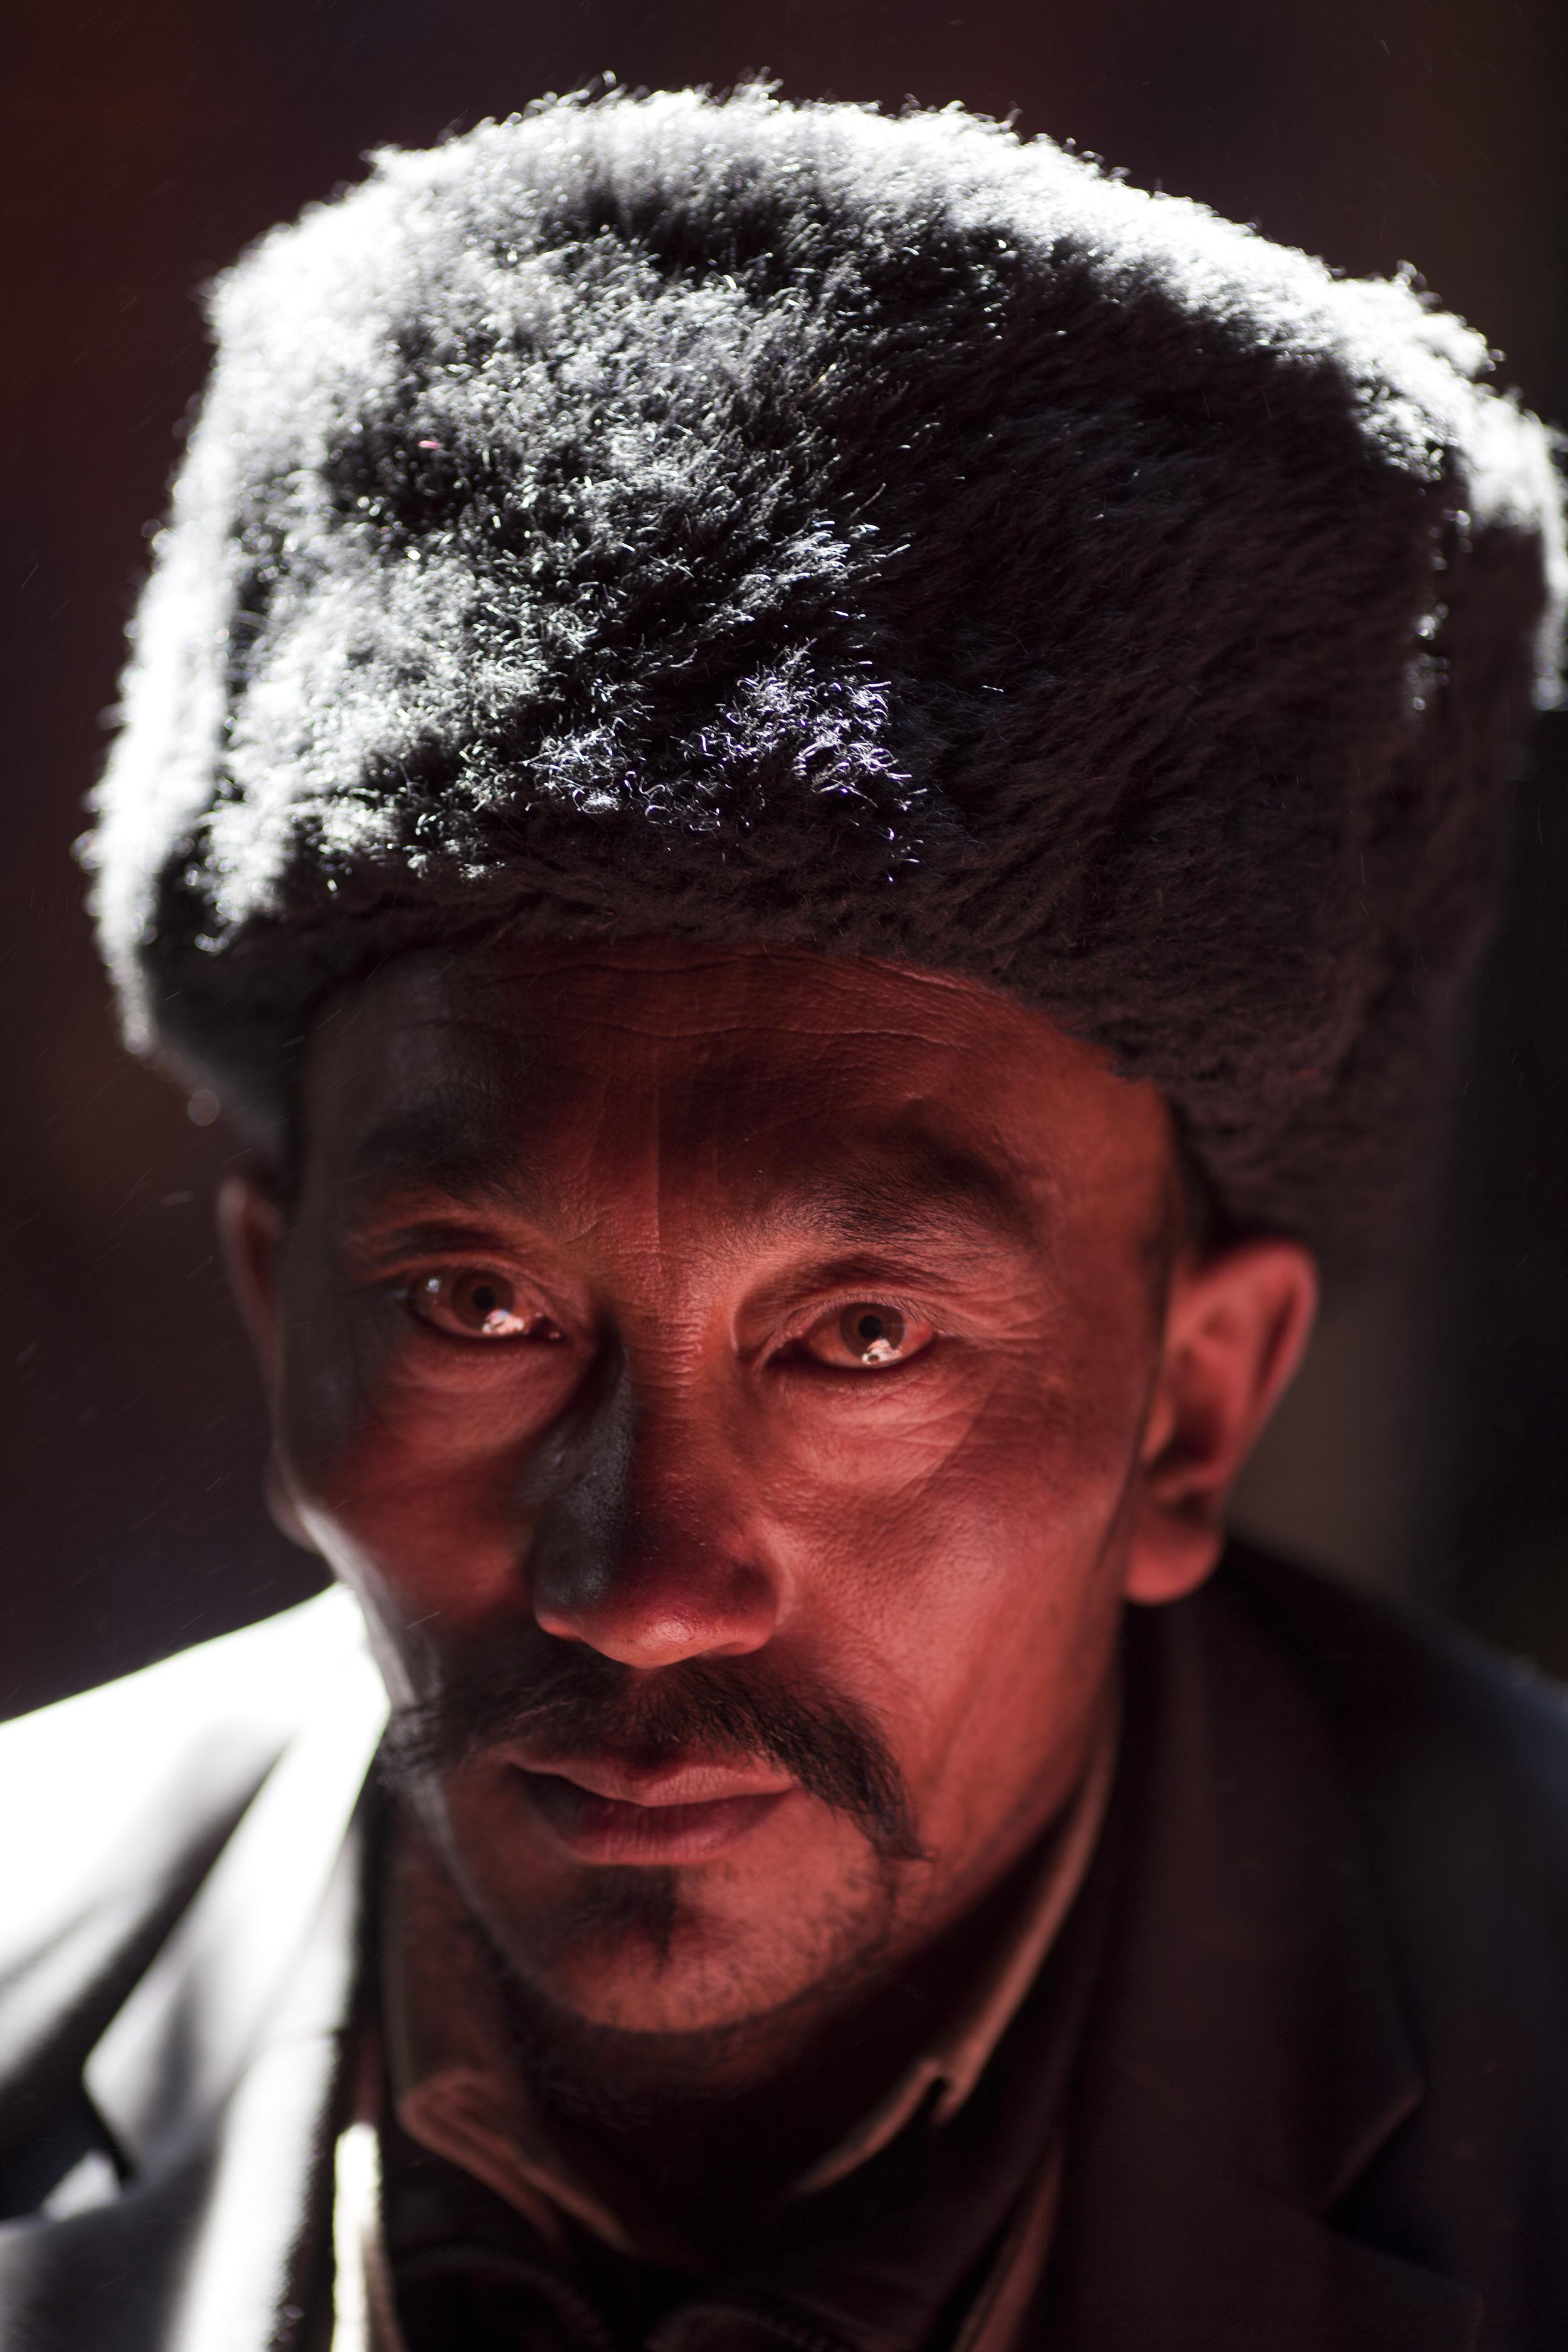 Afghan_Kyrgyz_07.JPG